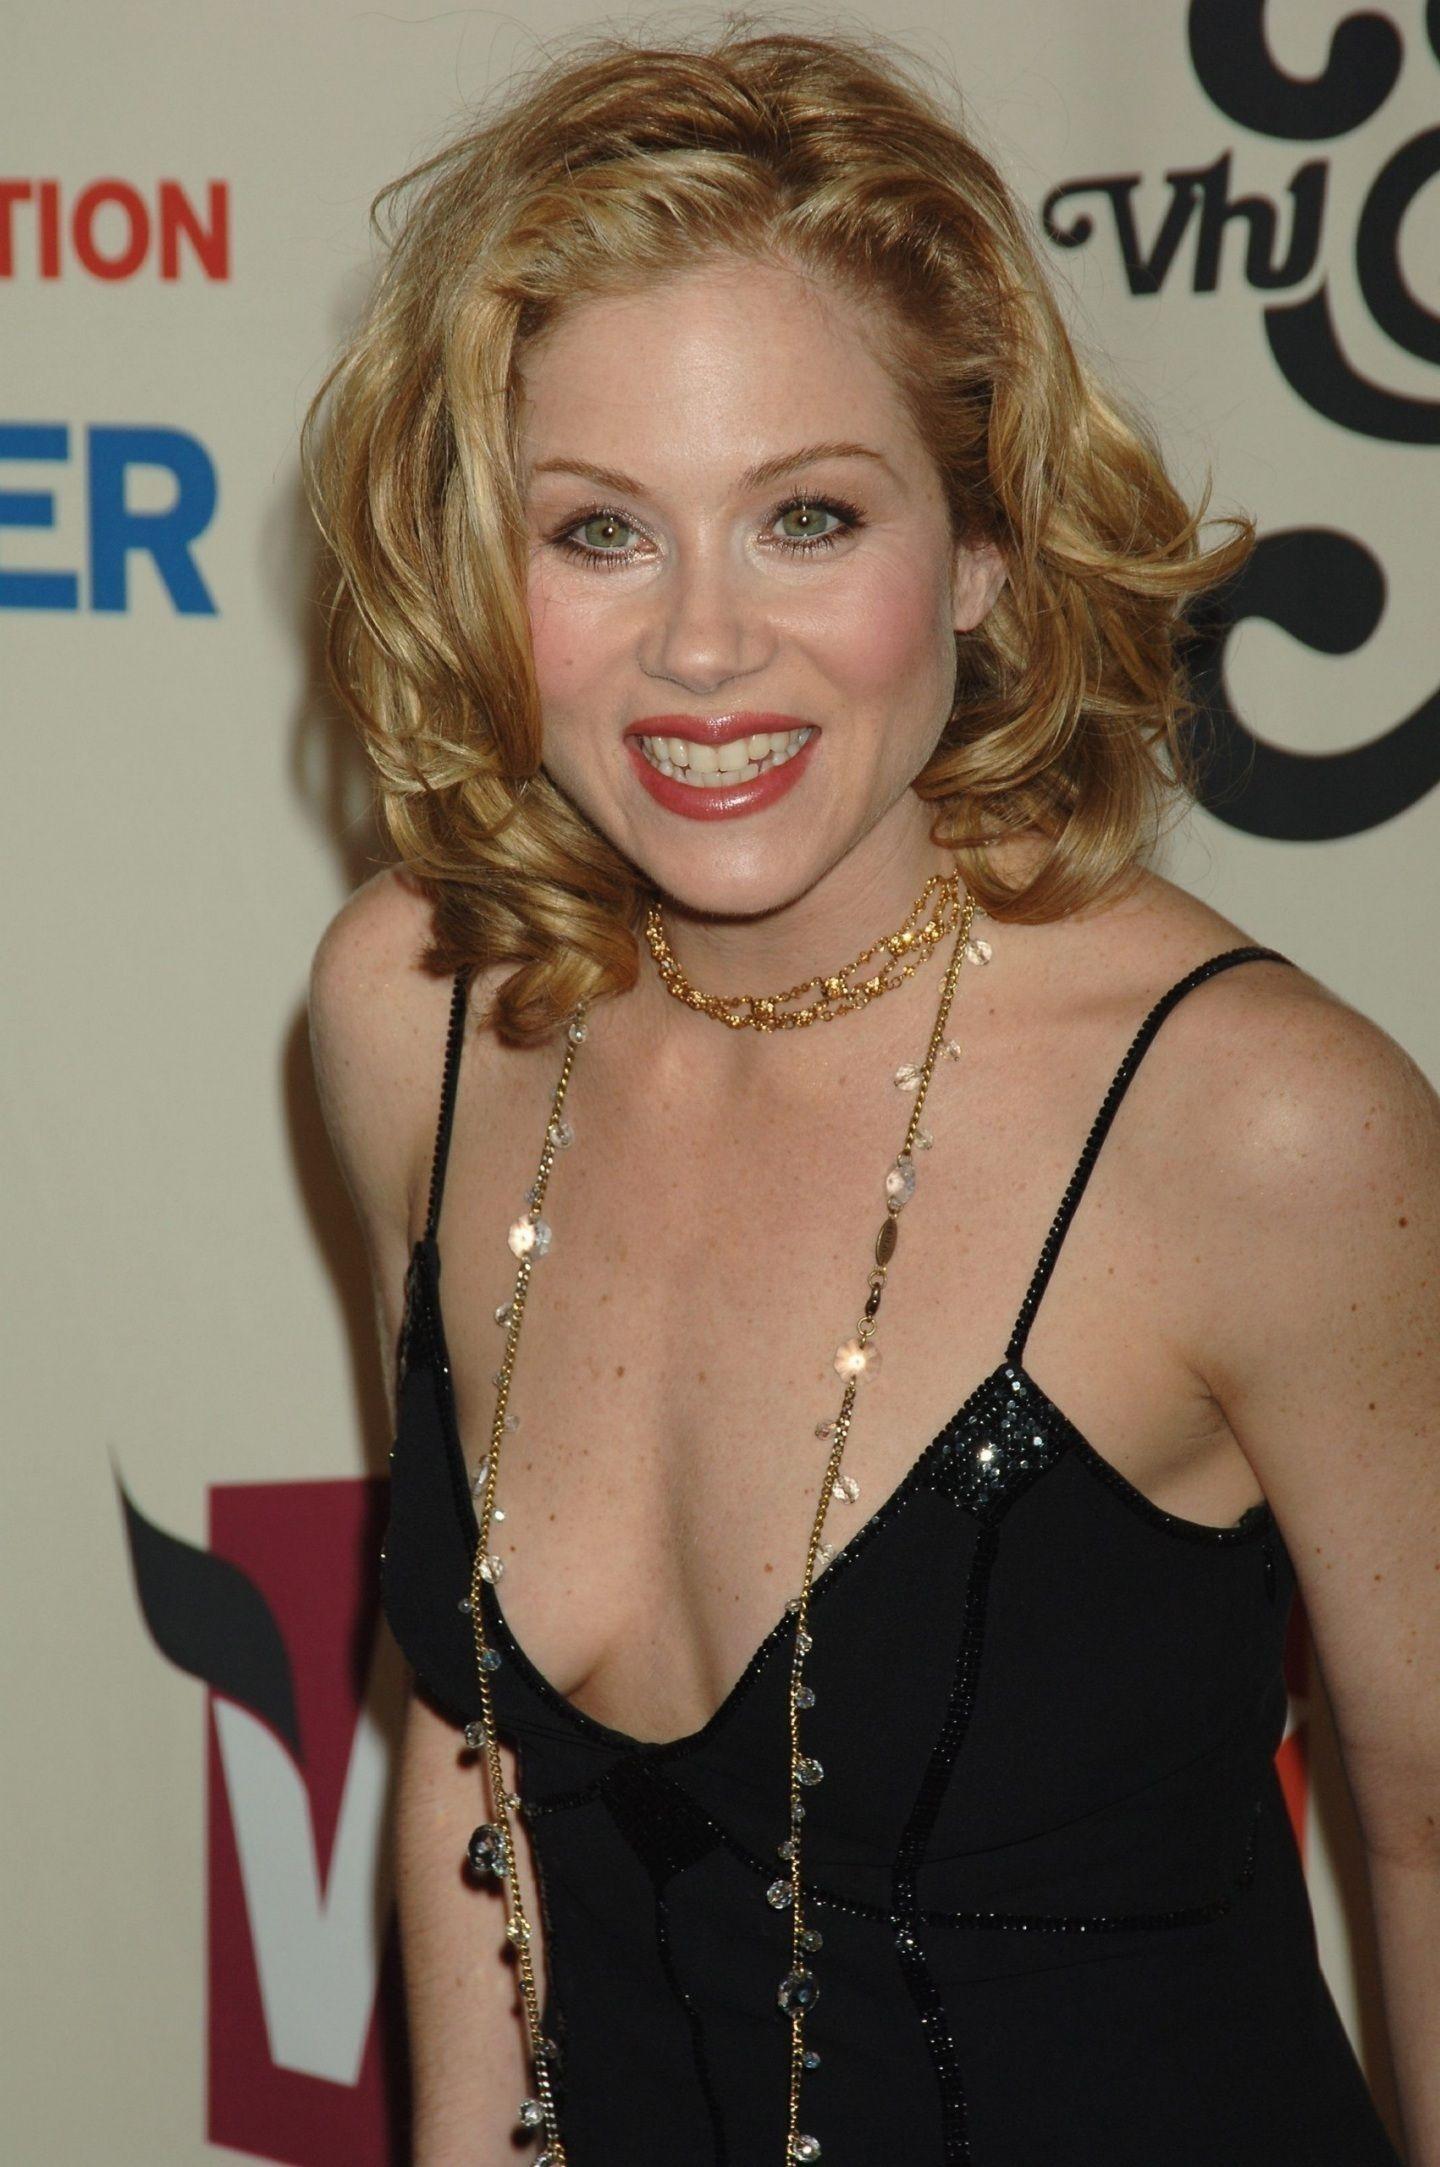 Christina Applegate born November 25, 1971 (age 46) Christina Applegate born November 25, 1971 (age 46) new photo